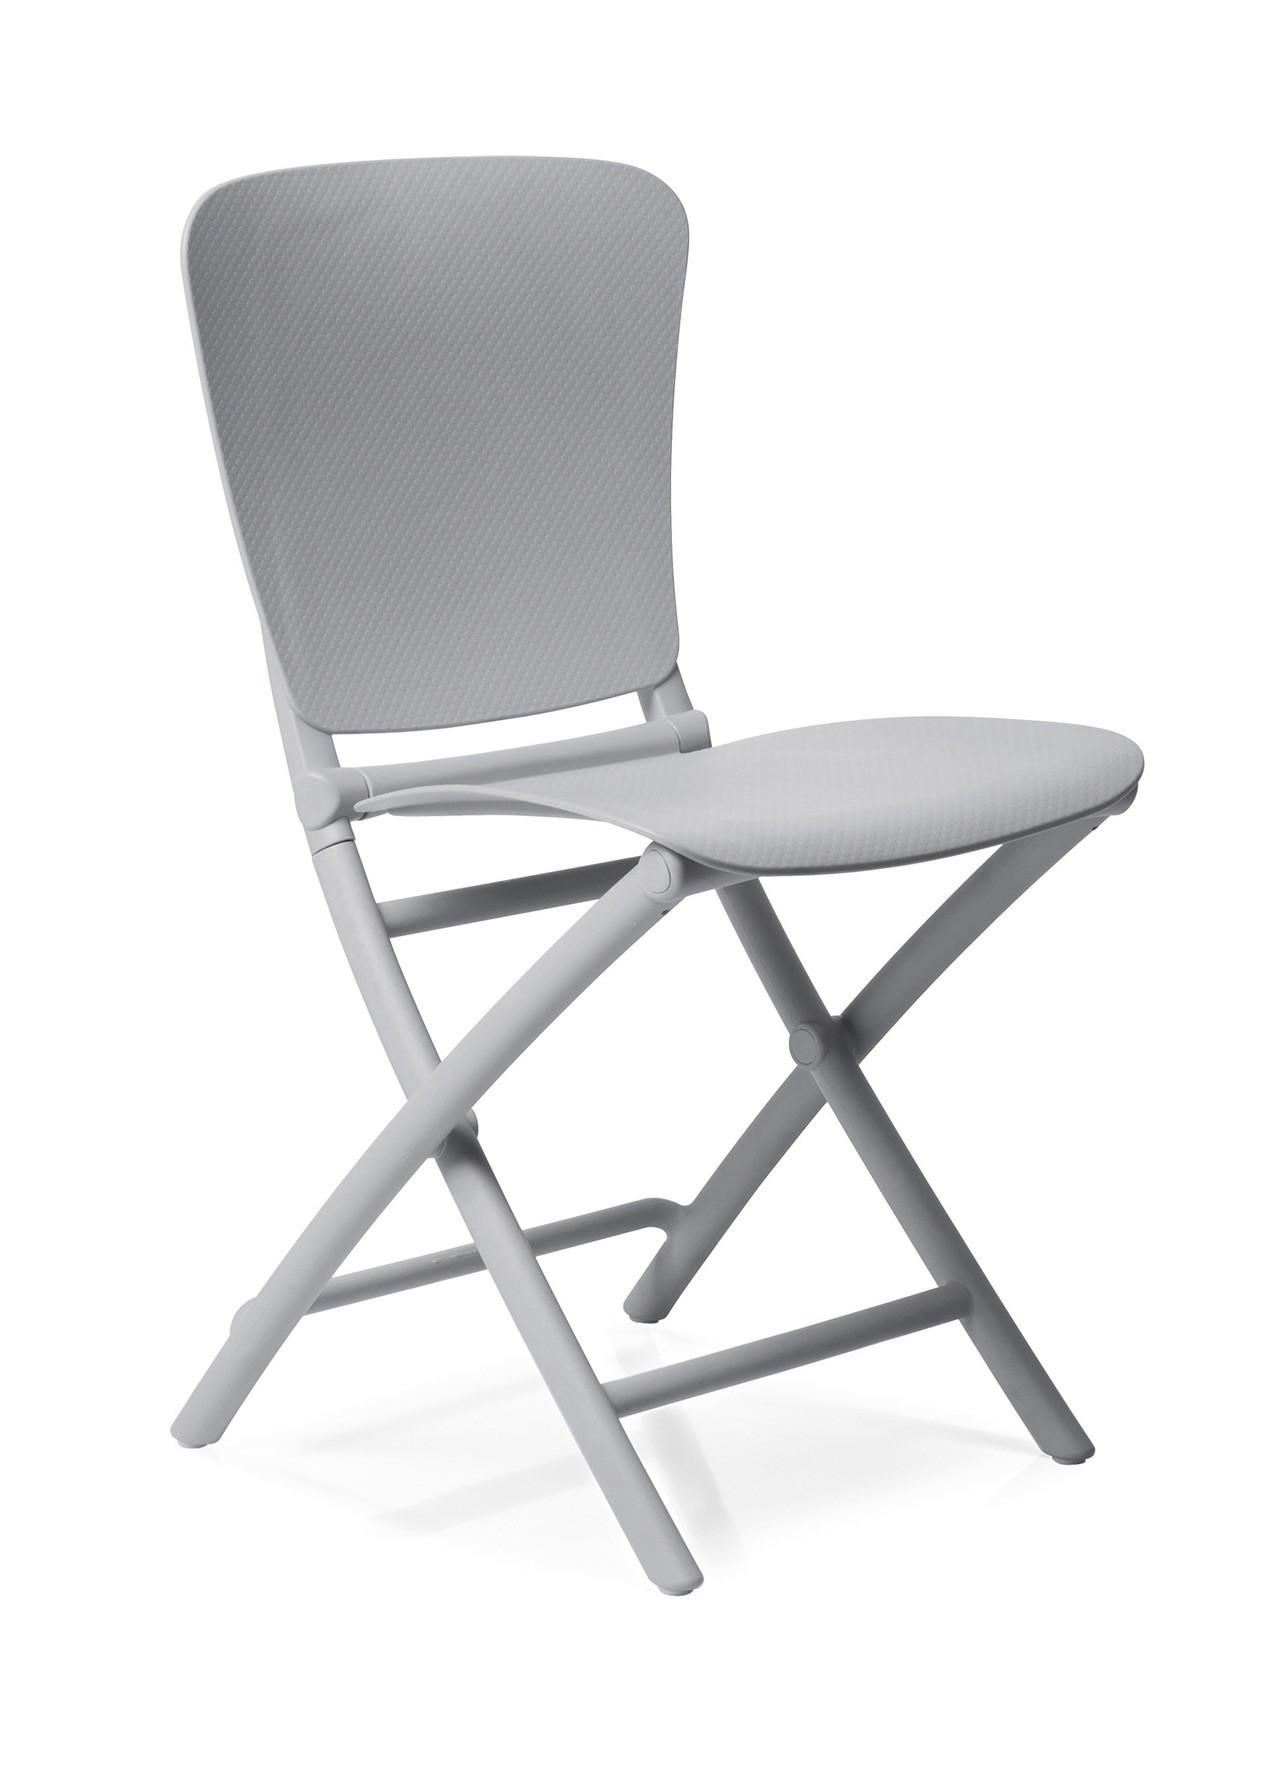 klappstuhl gartenstuhl zac classic kunststoff klappbar grigio bei. Black Bedroom Furniture Sets. Home Design Ideas